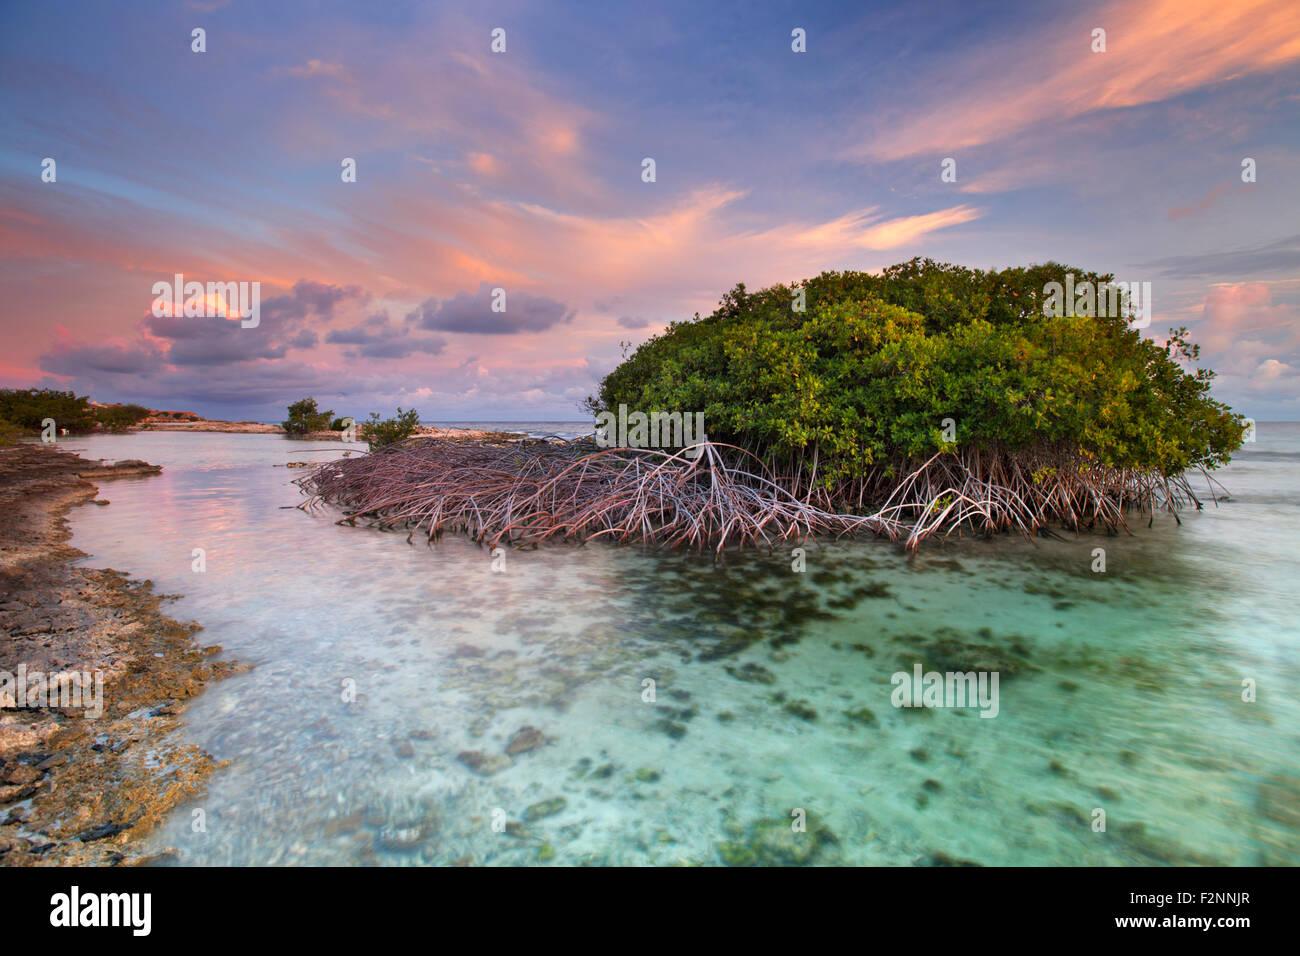 Lagoon Tropical Island: Mangrove Trees In A Tropical Lagoon On The Island Of